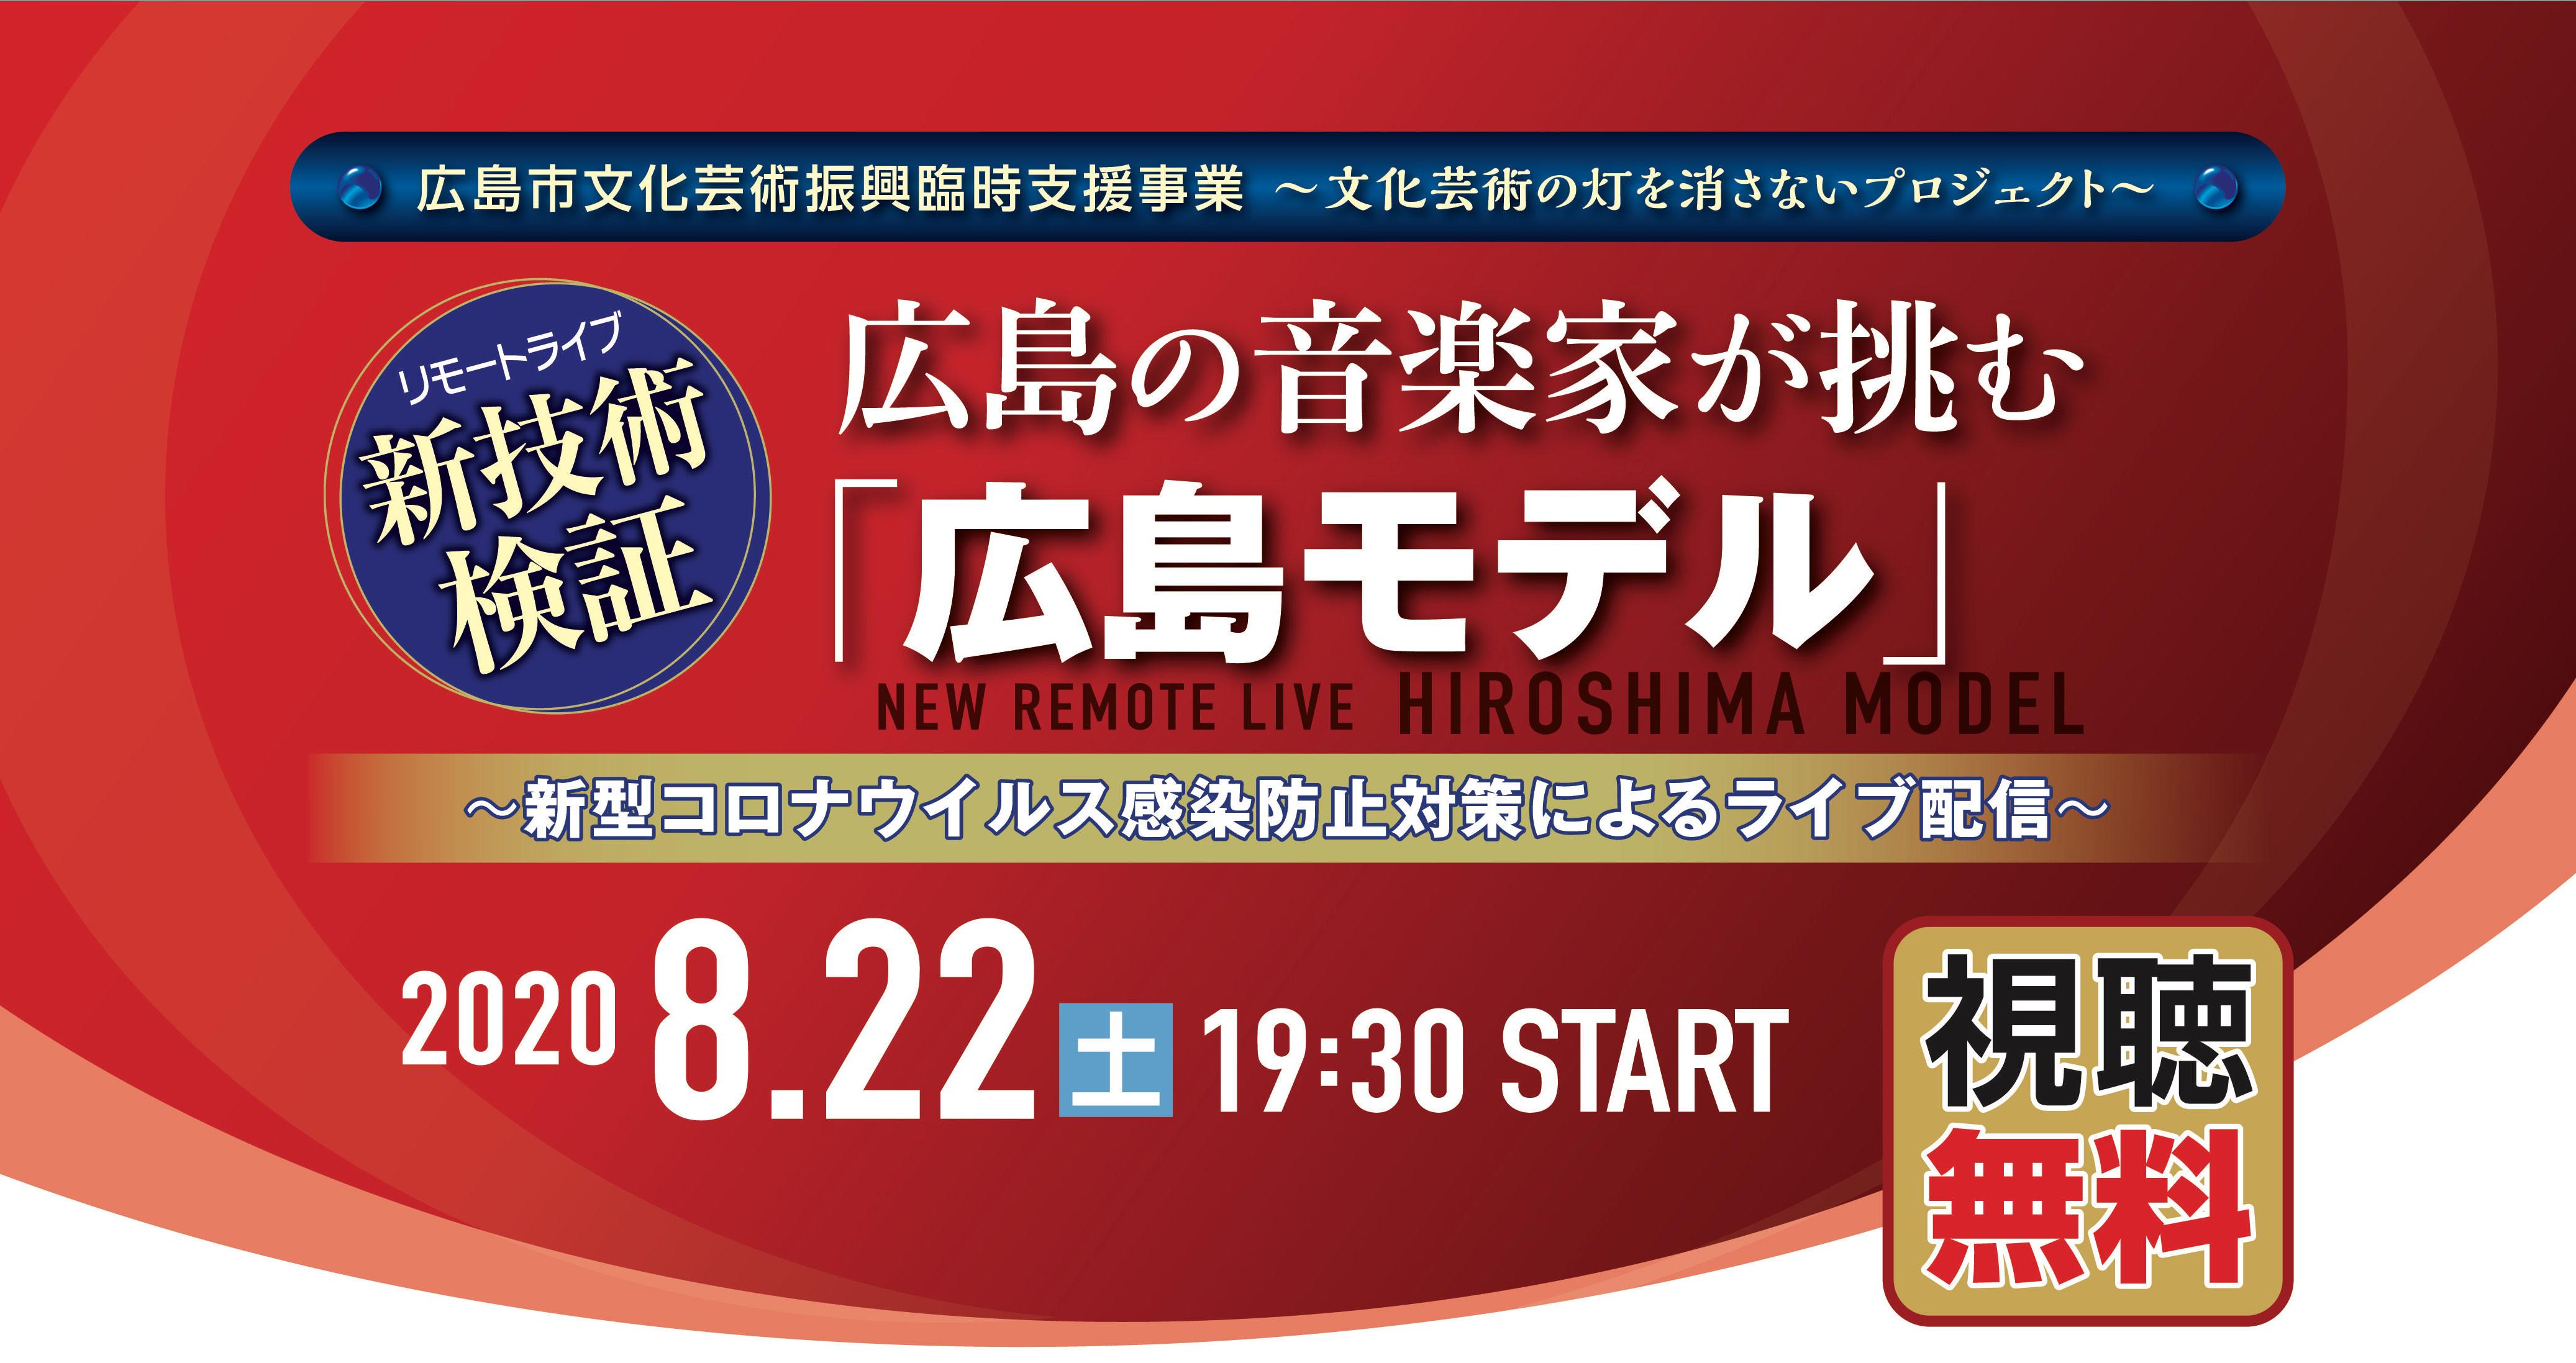 hiroshimamodel.outlineのコピーのコピー.jpg